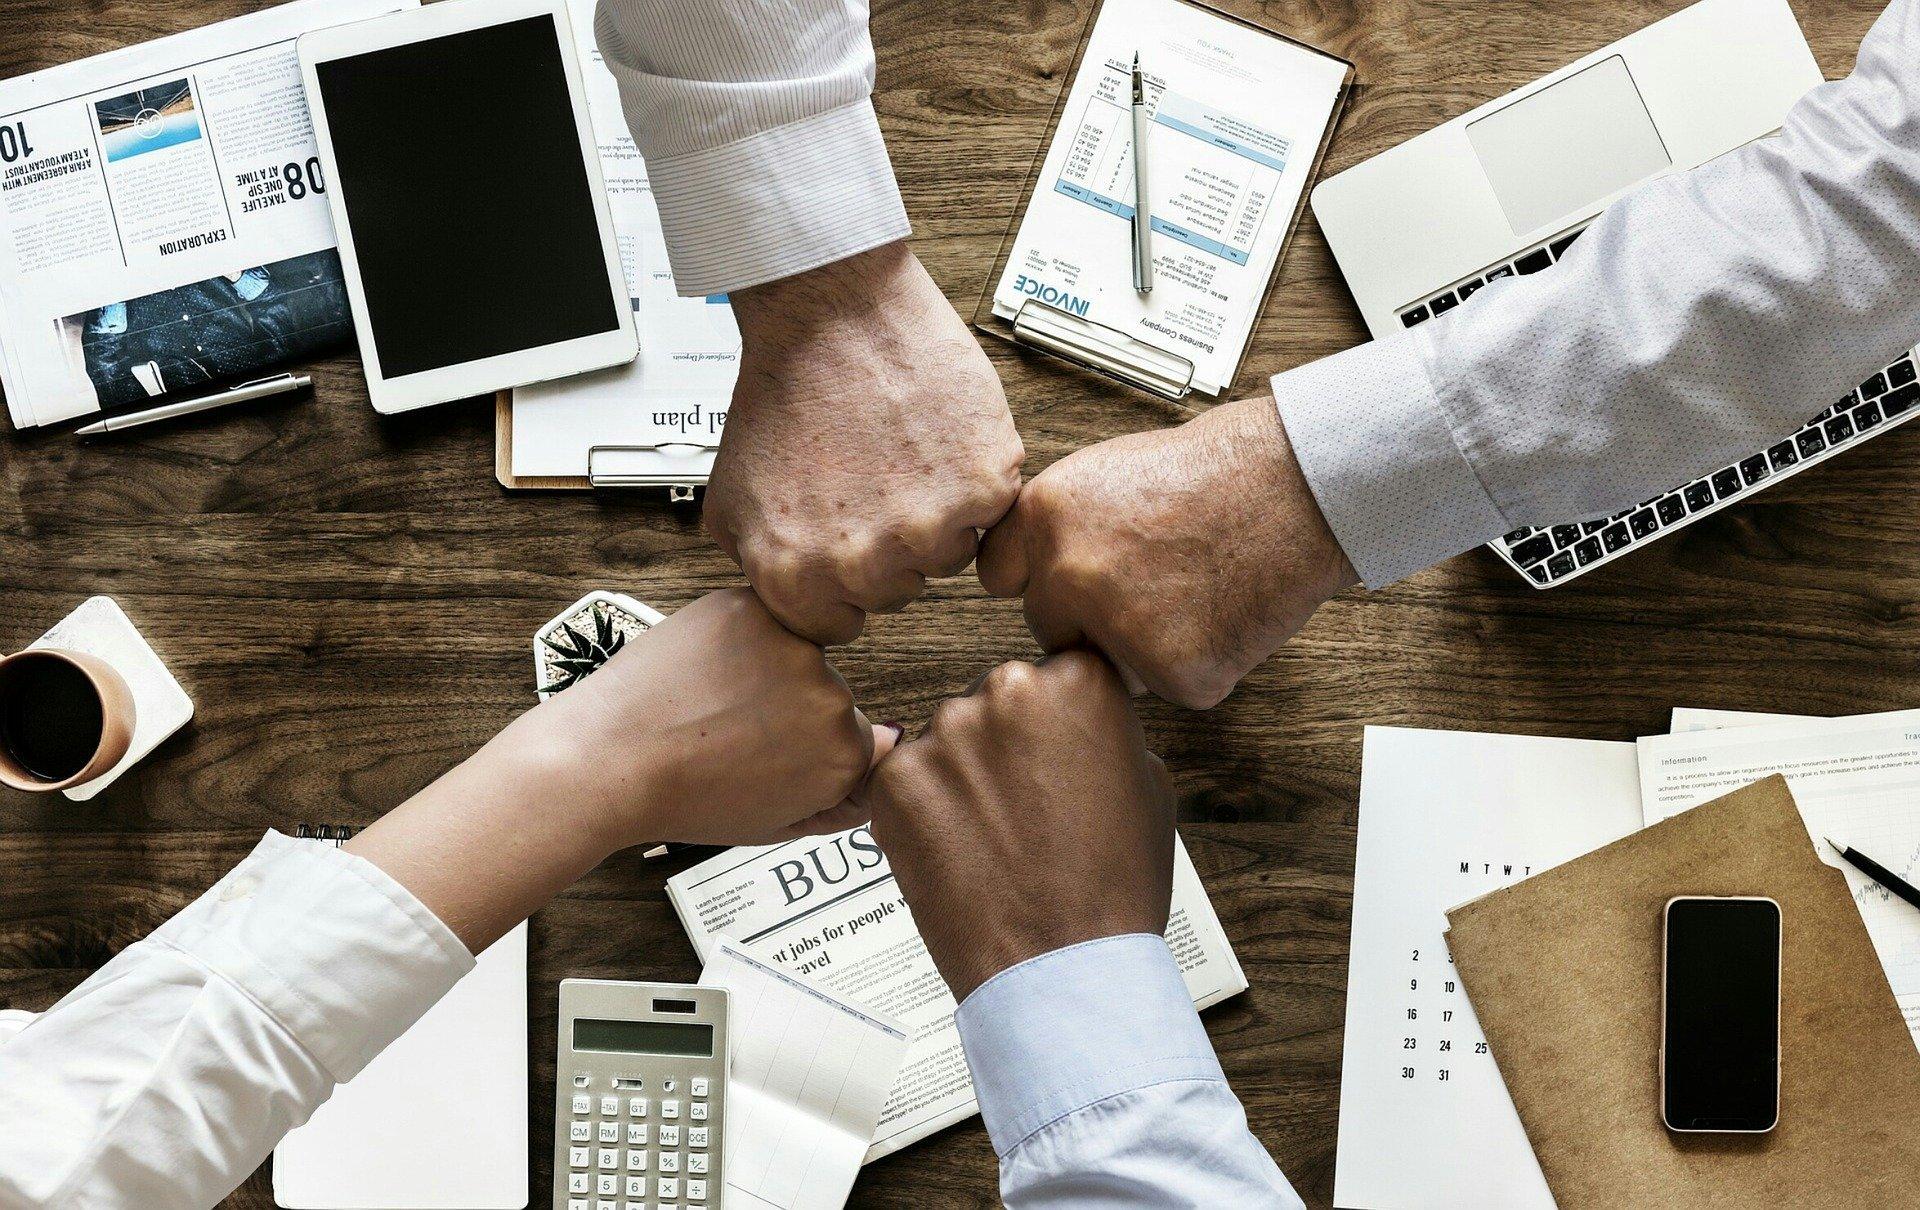 Business Growth Loan Scheme